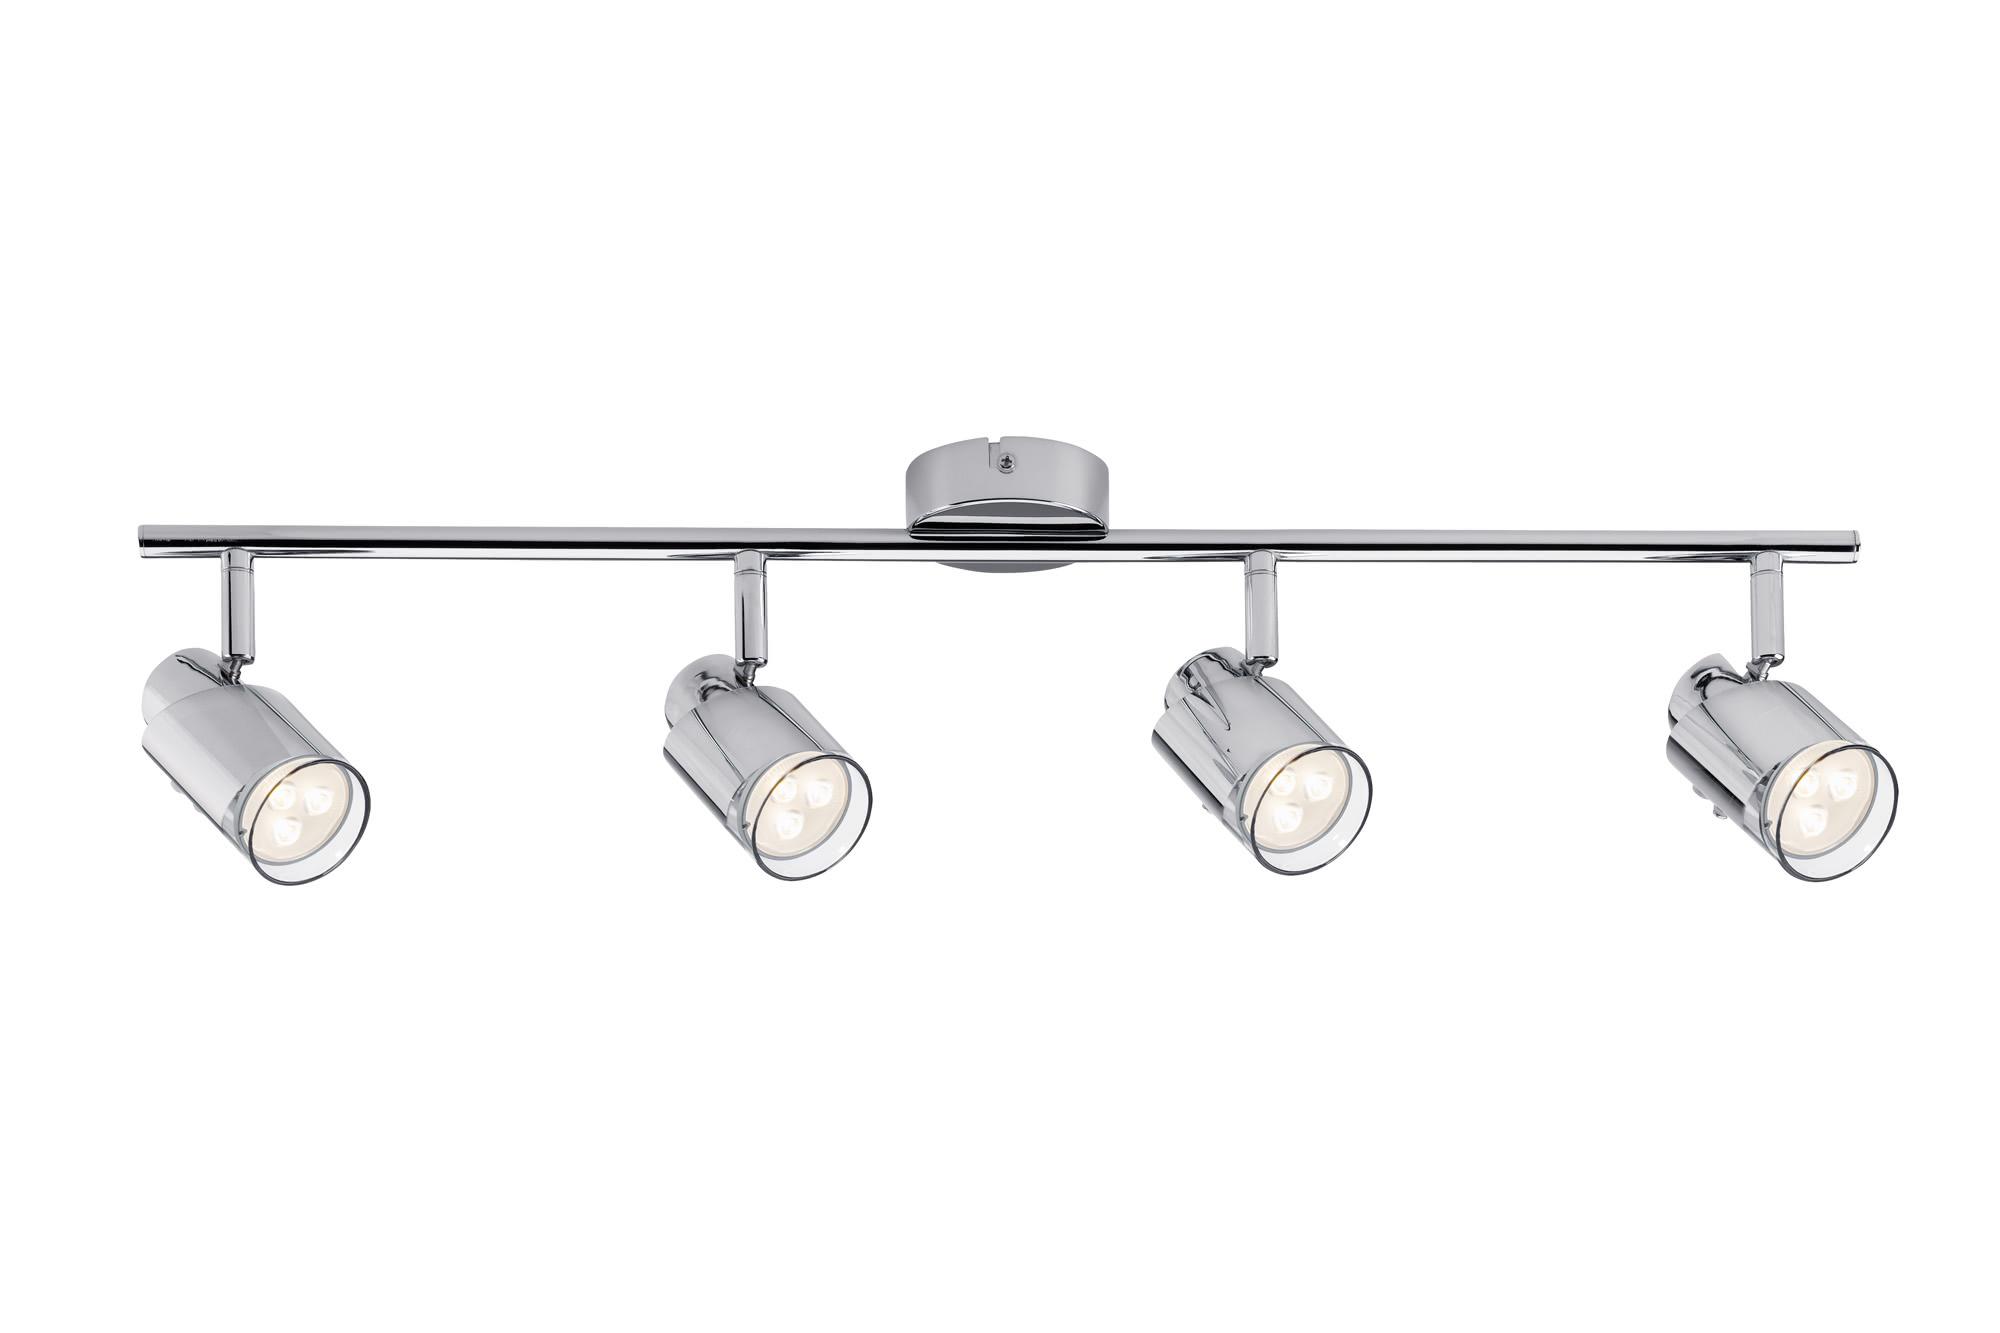 Paulmann. 60181 Светильник SL Futura LED Stange 4x3,5W GU10 Chr